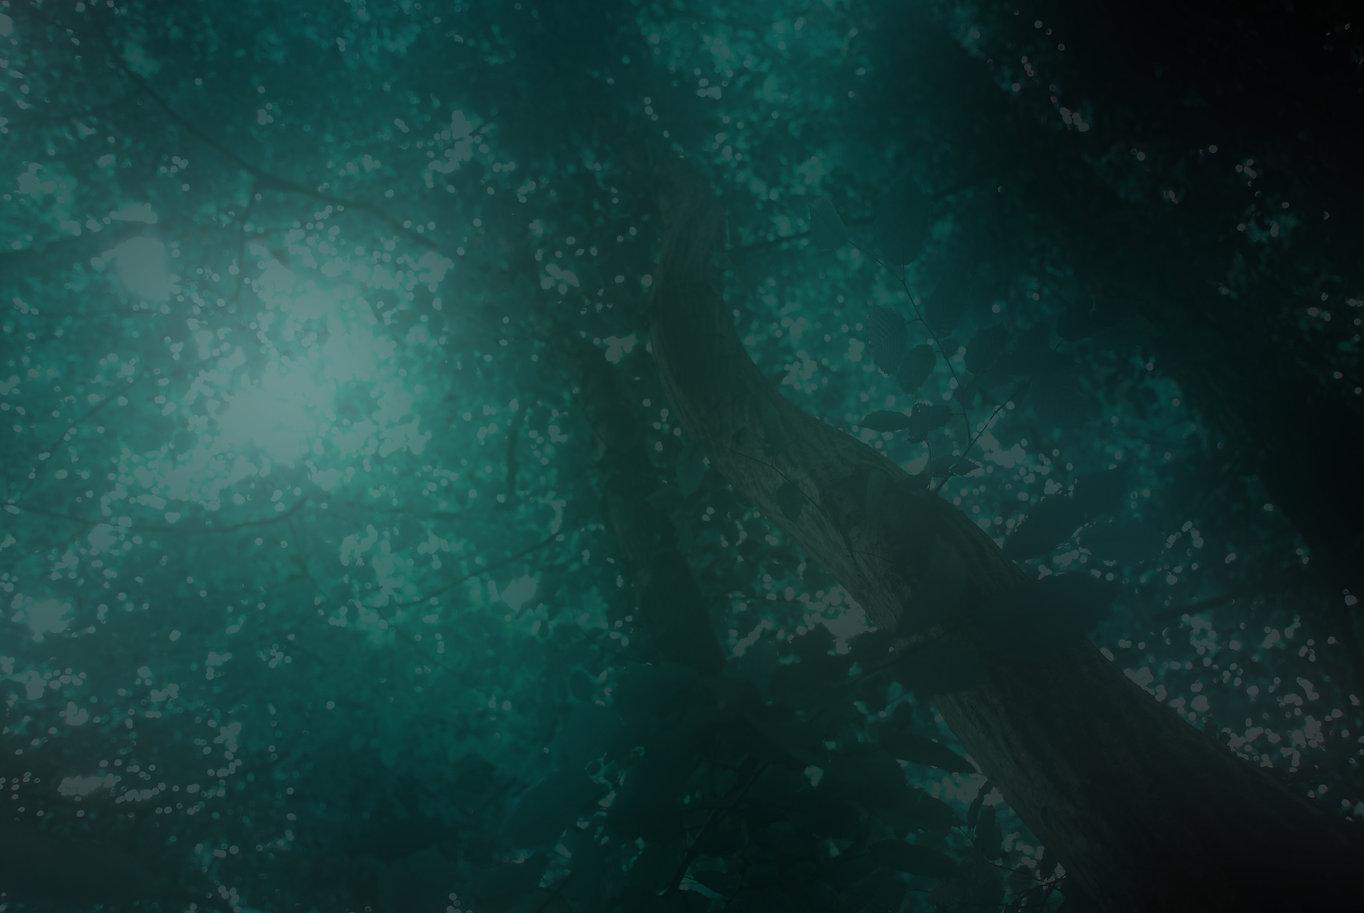 Grovewood 9–Blur 2.jpg